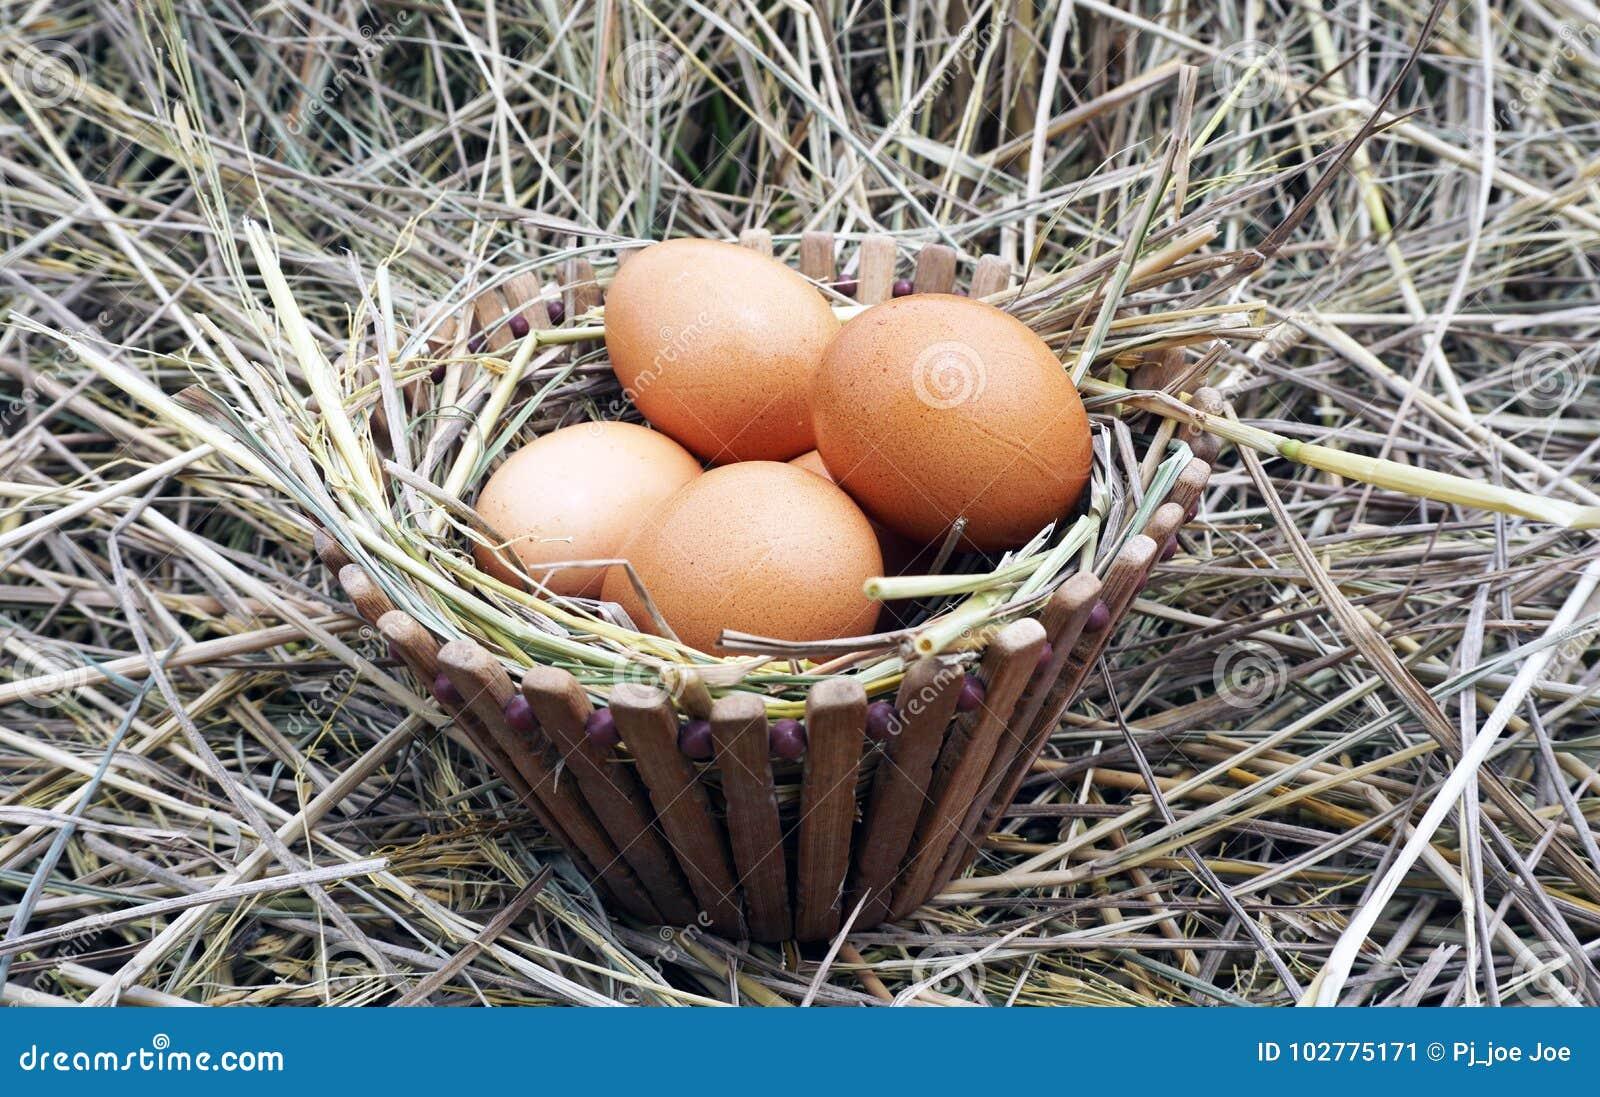 Bruine eieren in houten kom